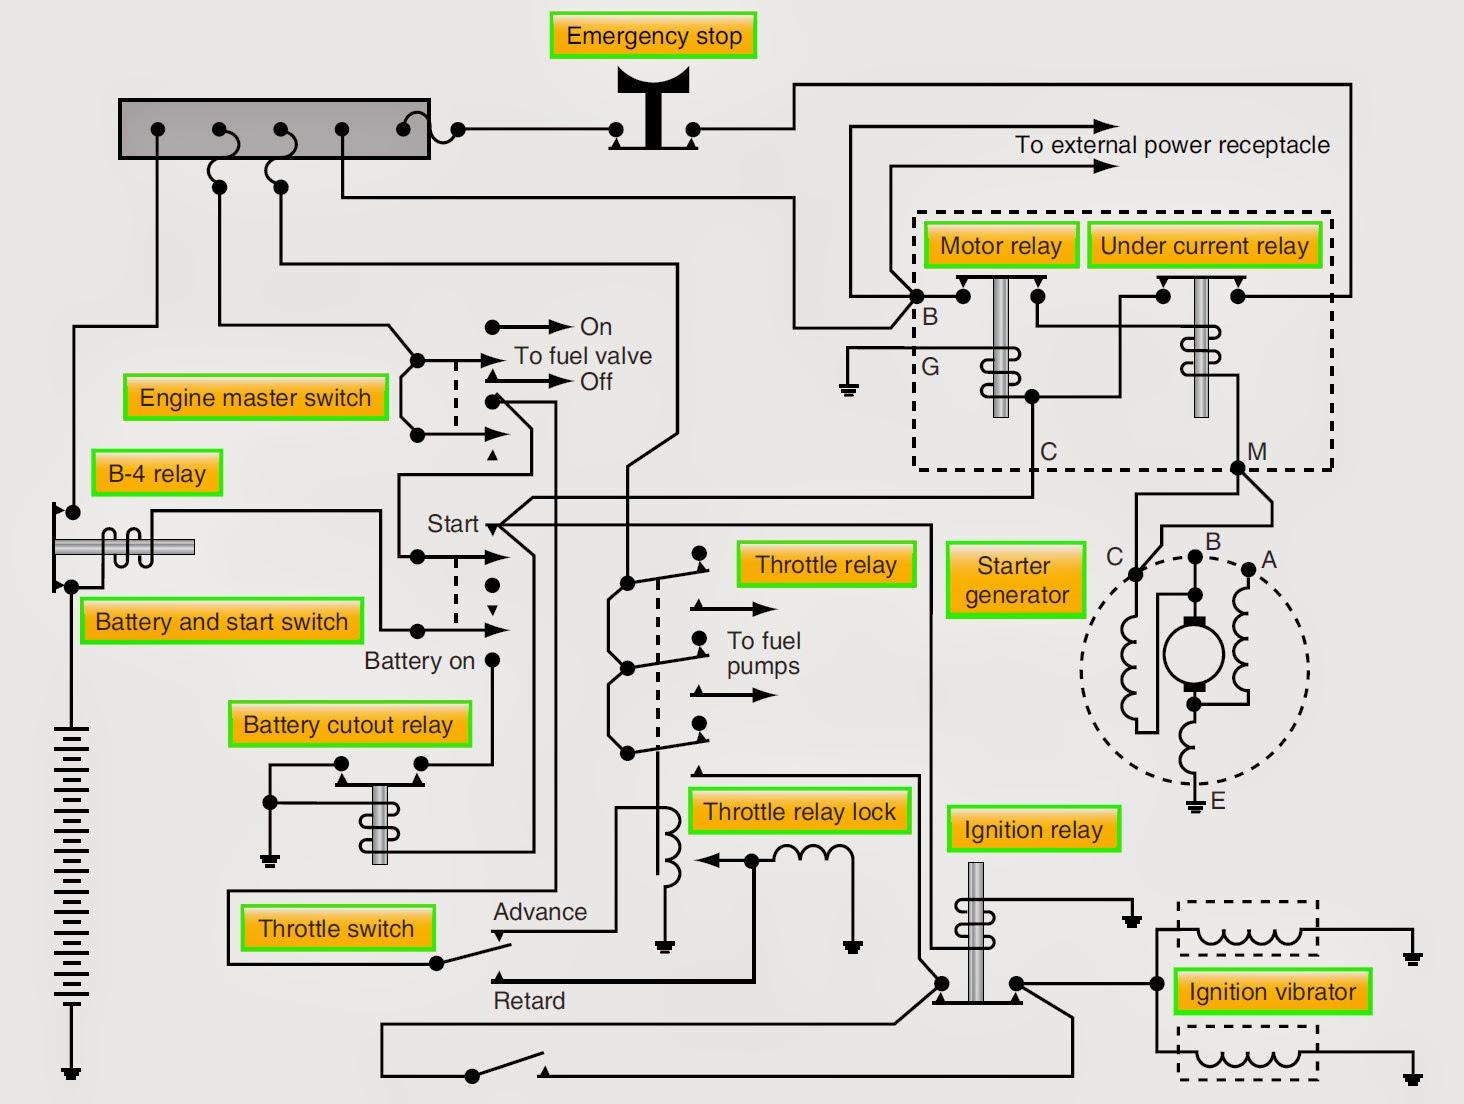 [DIAGRAM_1CA]  WZ_3230] Integrated Starter Generator Wiring Diagram Free Diagram | Integrated Starter Generator Wiring Diagram |  | Barba Hylec Pap Rect Mohammedshrine Librar Wiring 101